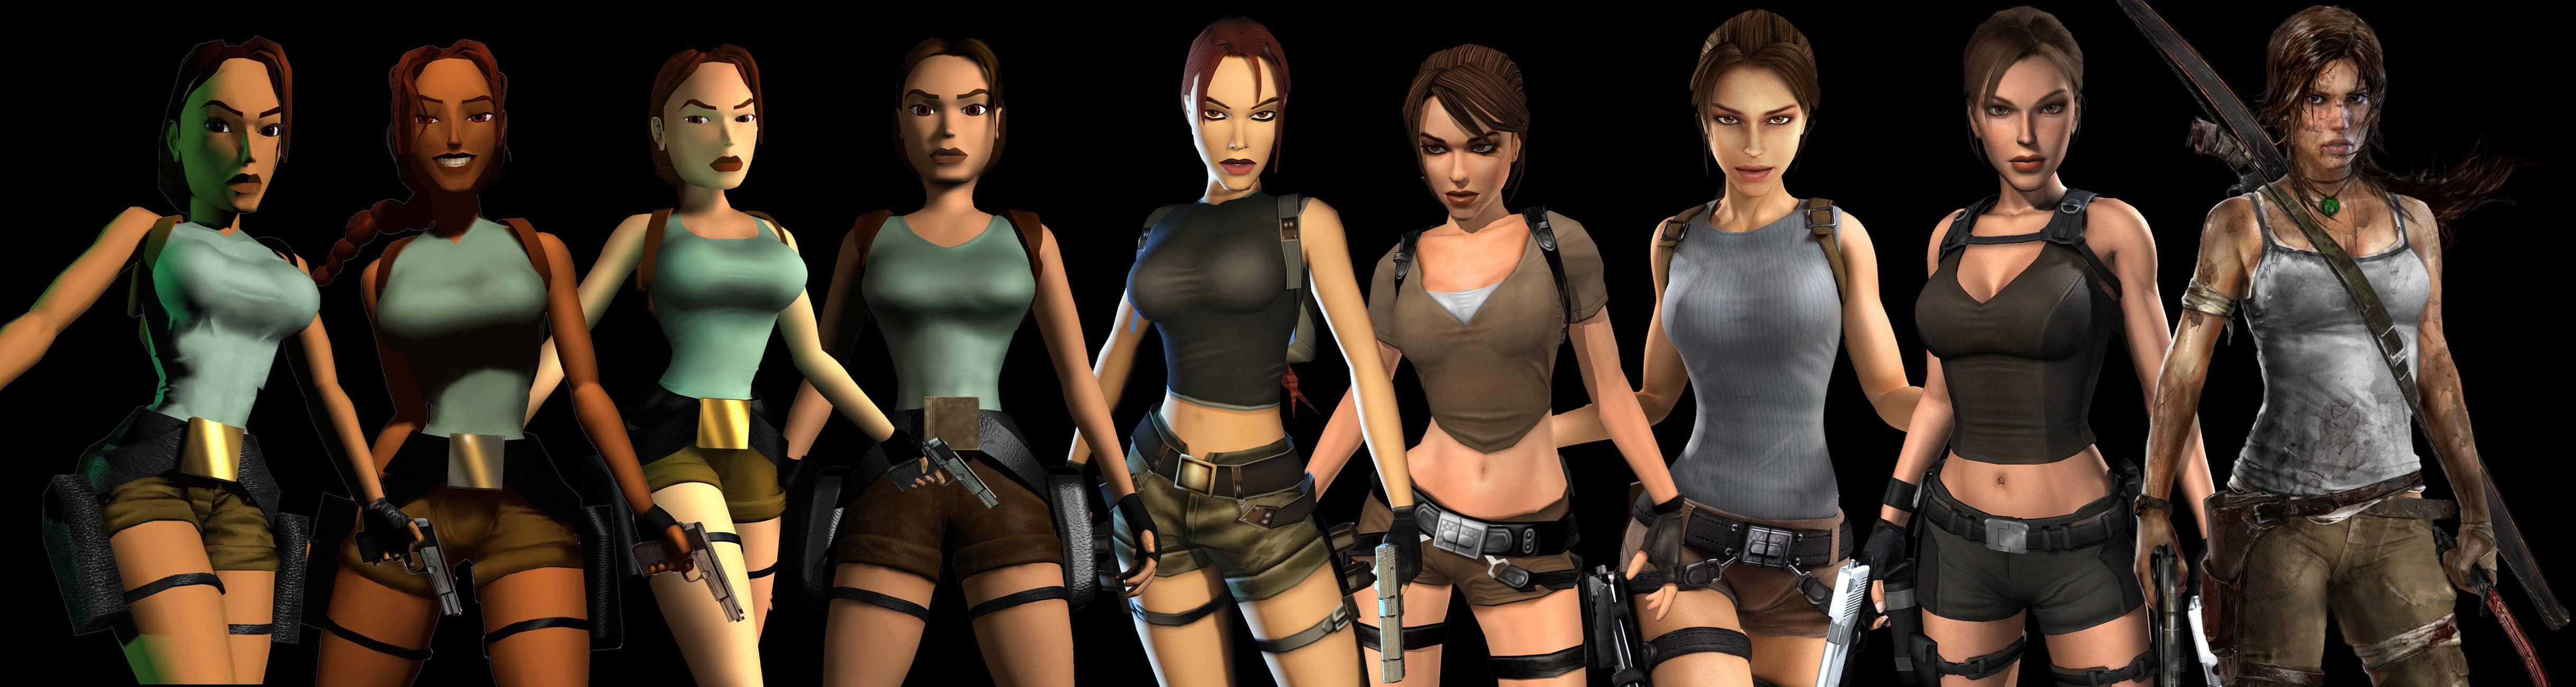 Make Lara Croft Naked – video game myth